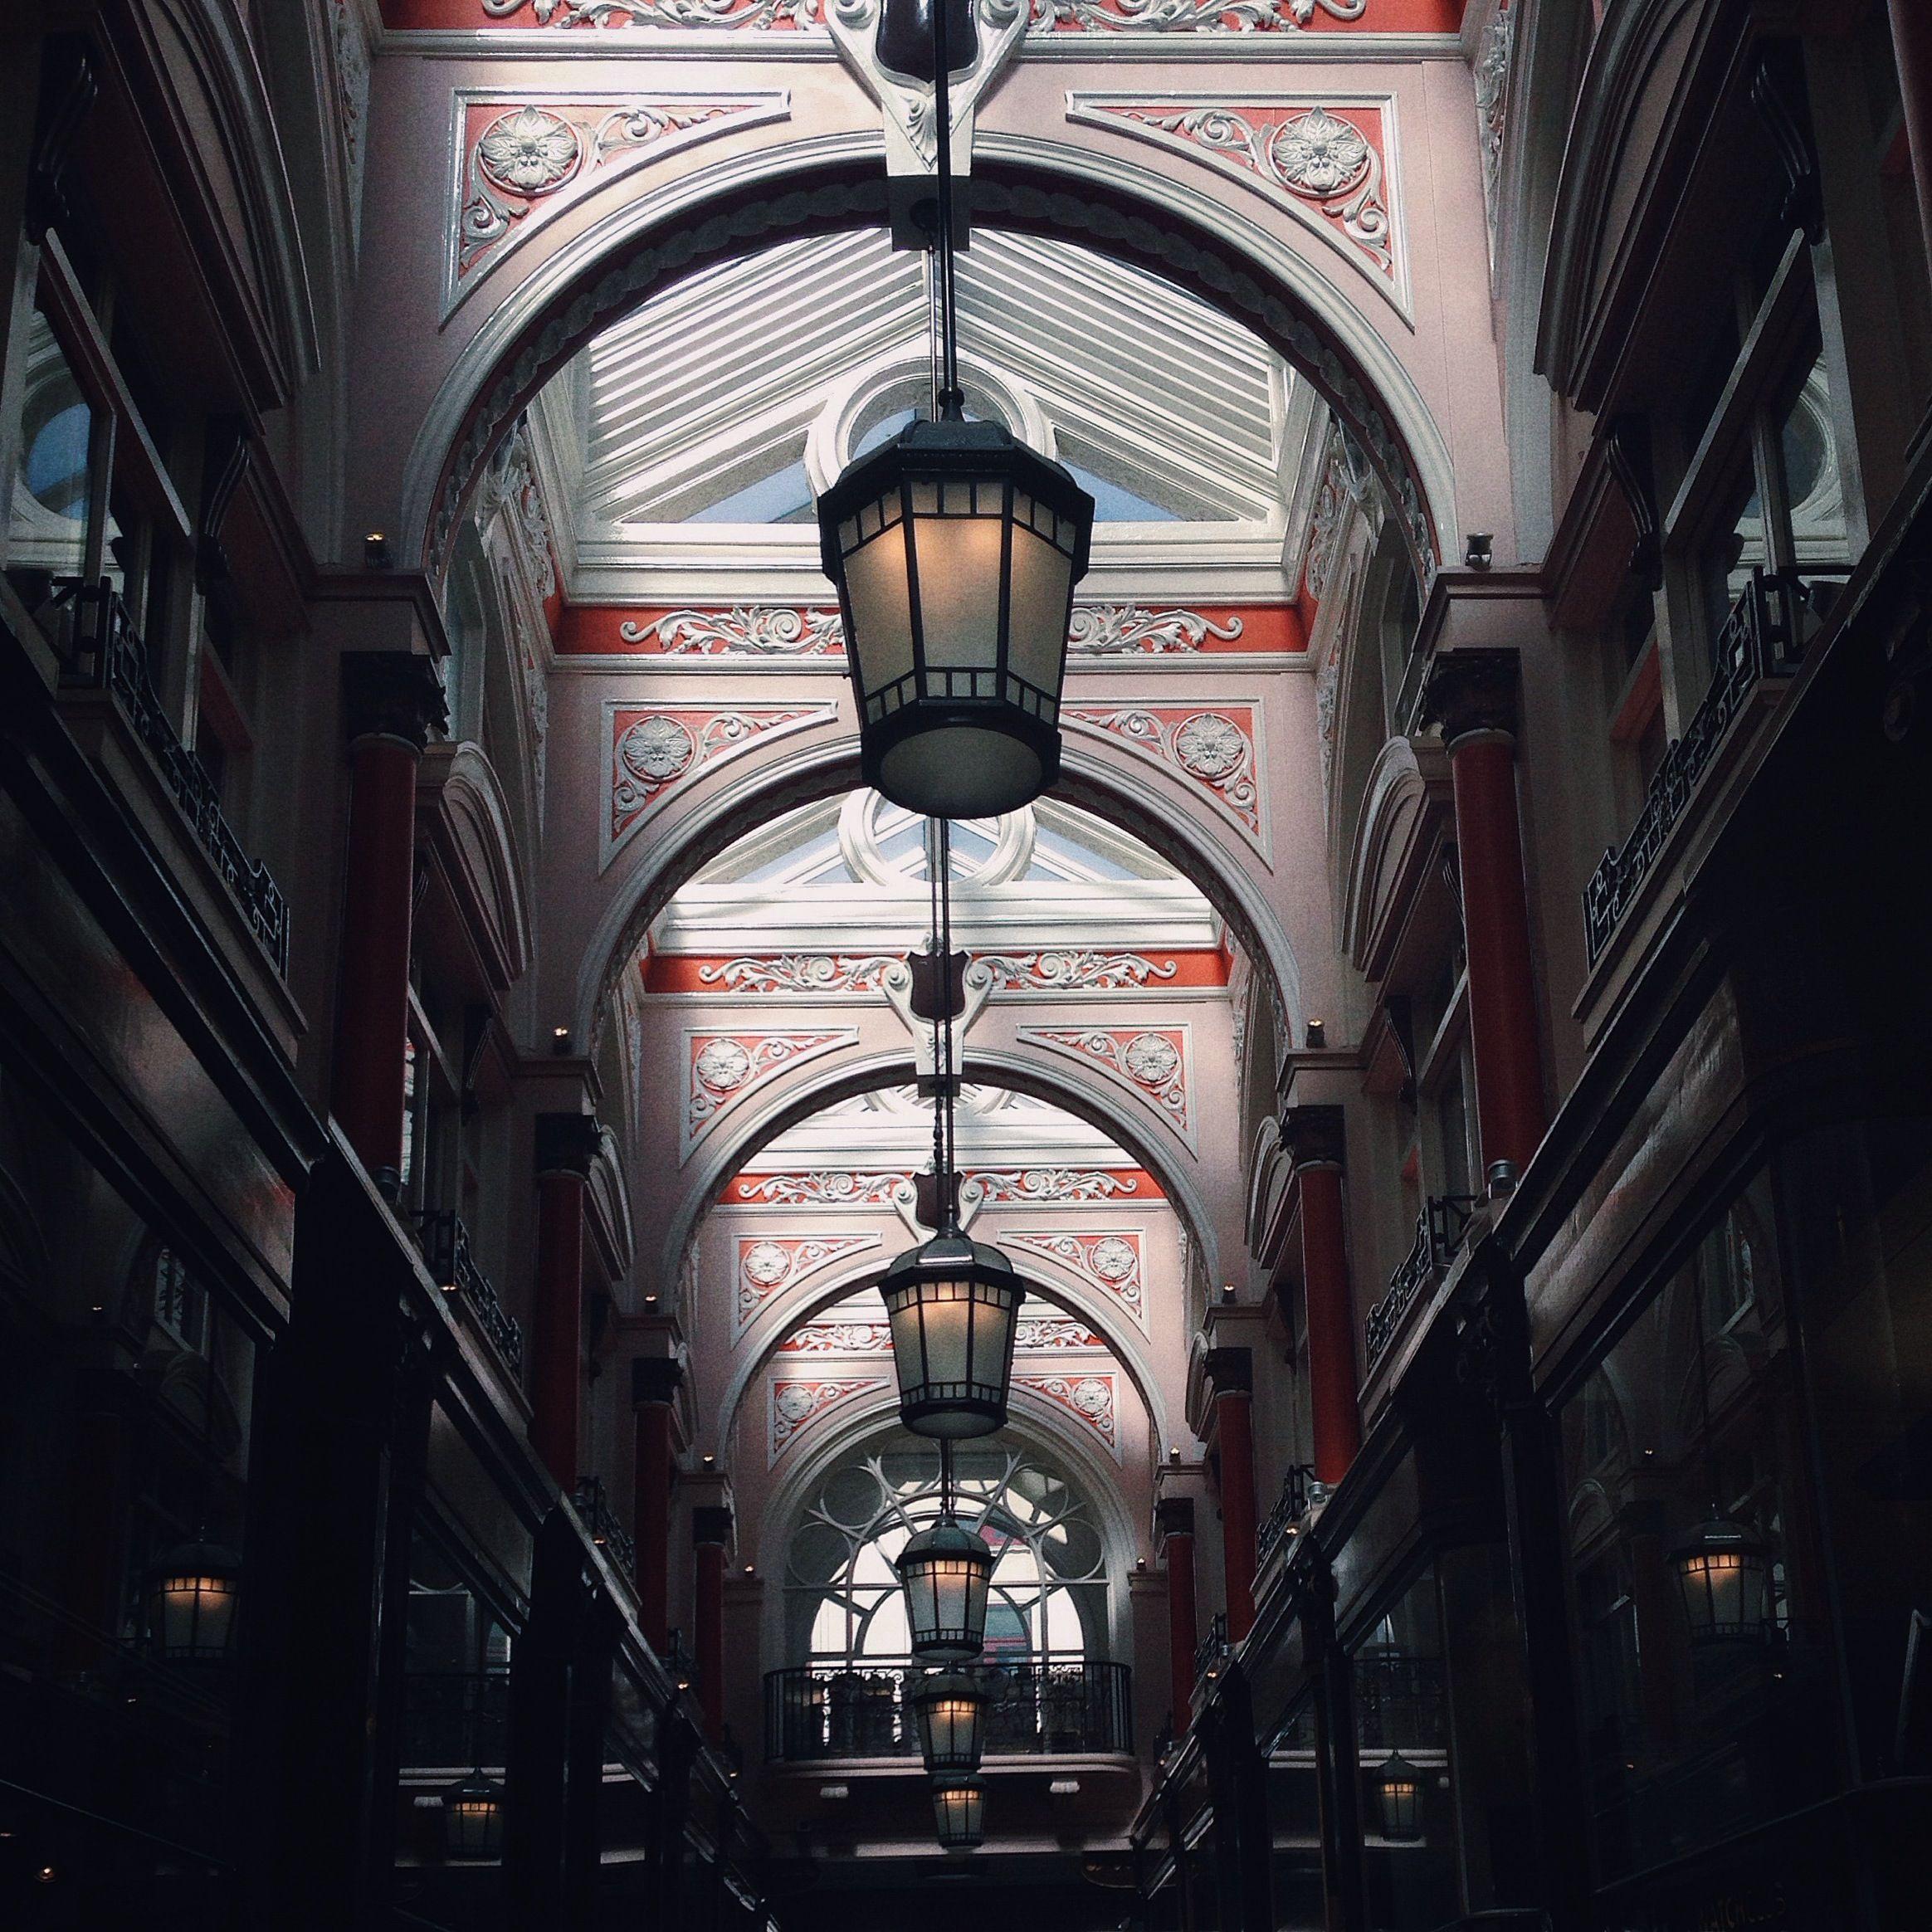 Arcade on Old Bond Street, London. Photo: Rob Bentley 09.5.15 #london #architecure